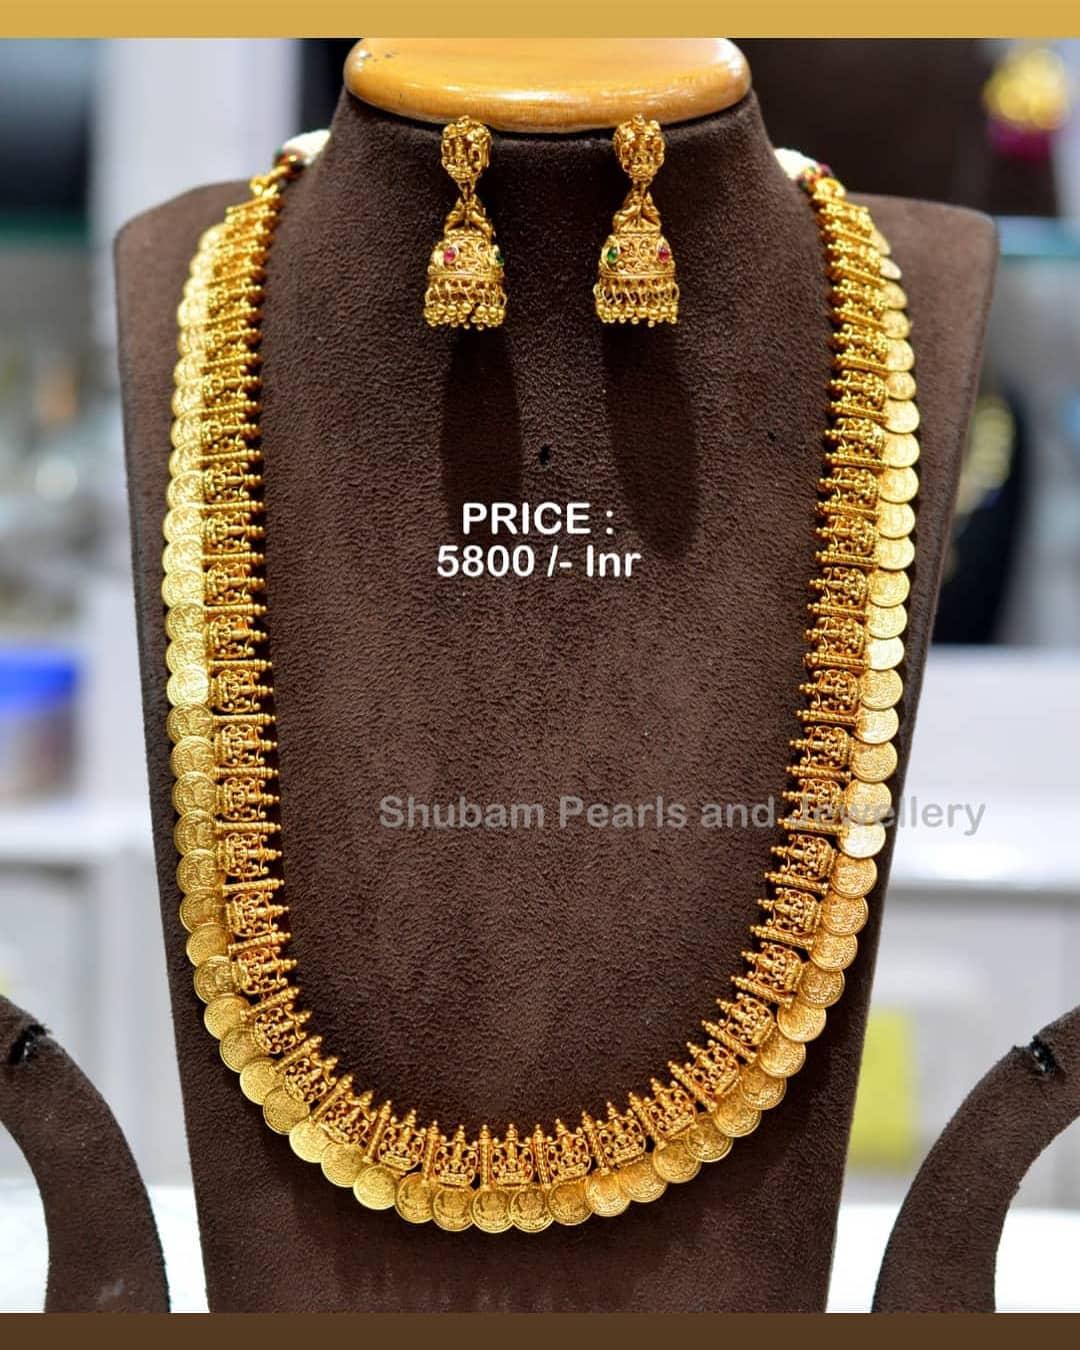 Beautiful one gram gold Lakshmi kasu long haarm with buttalu. Price : 5800/- one gram gold long chain designs 1 gram jewellery online one gram gold temple jewellery